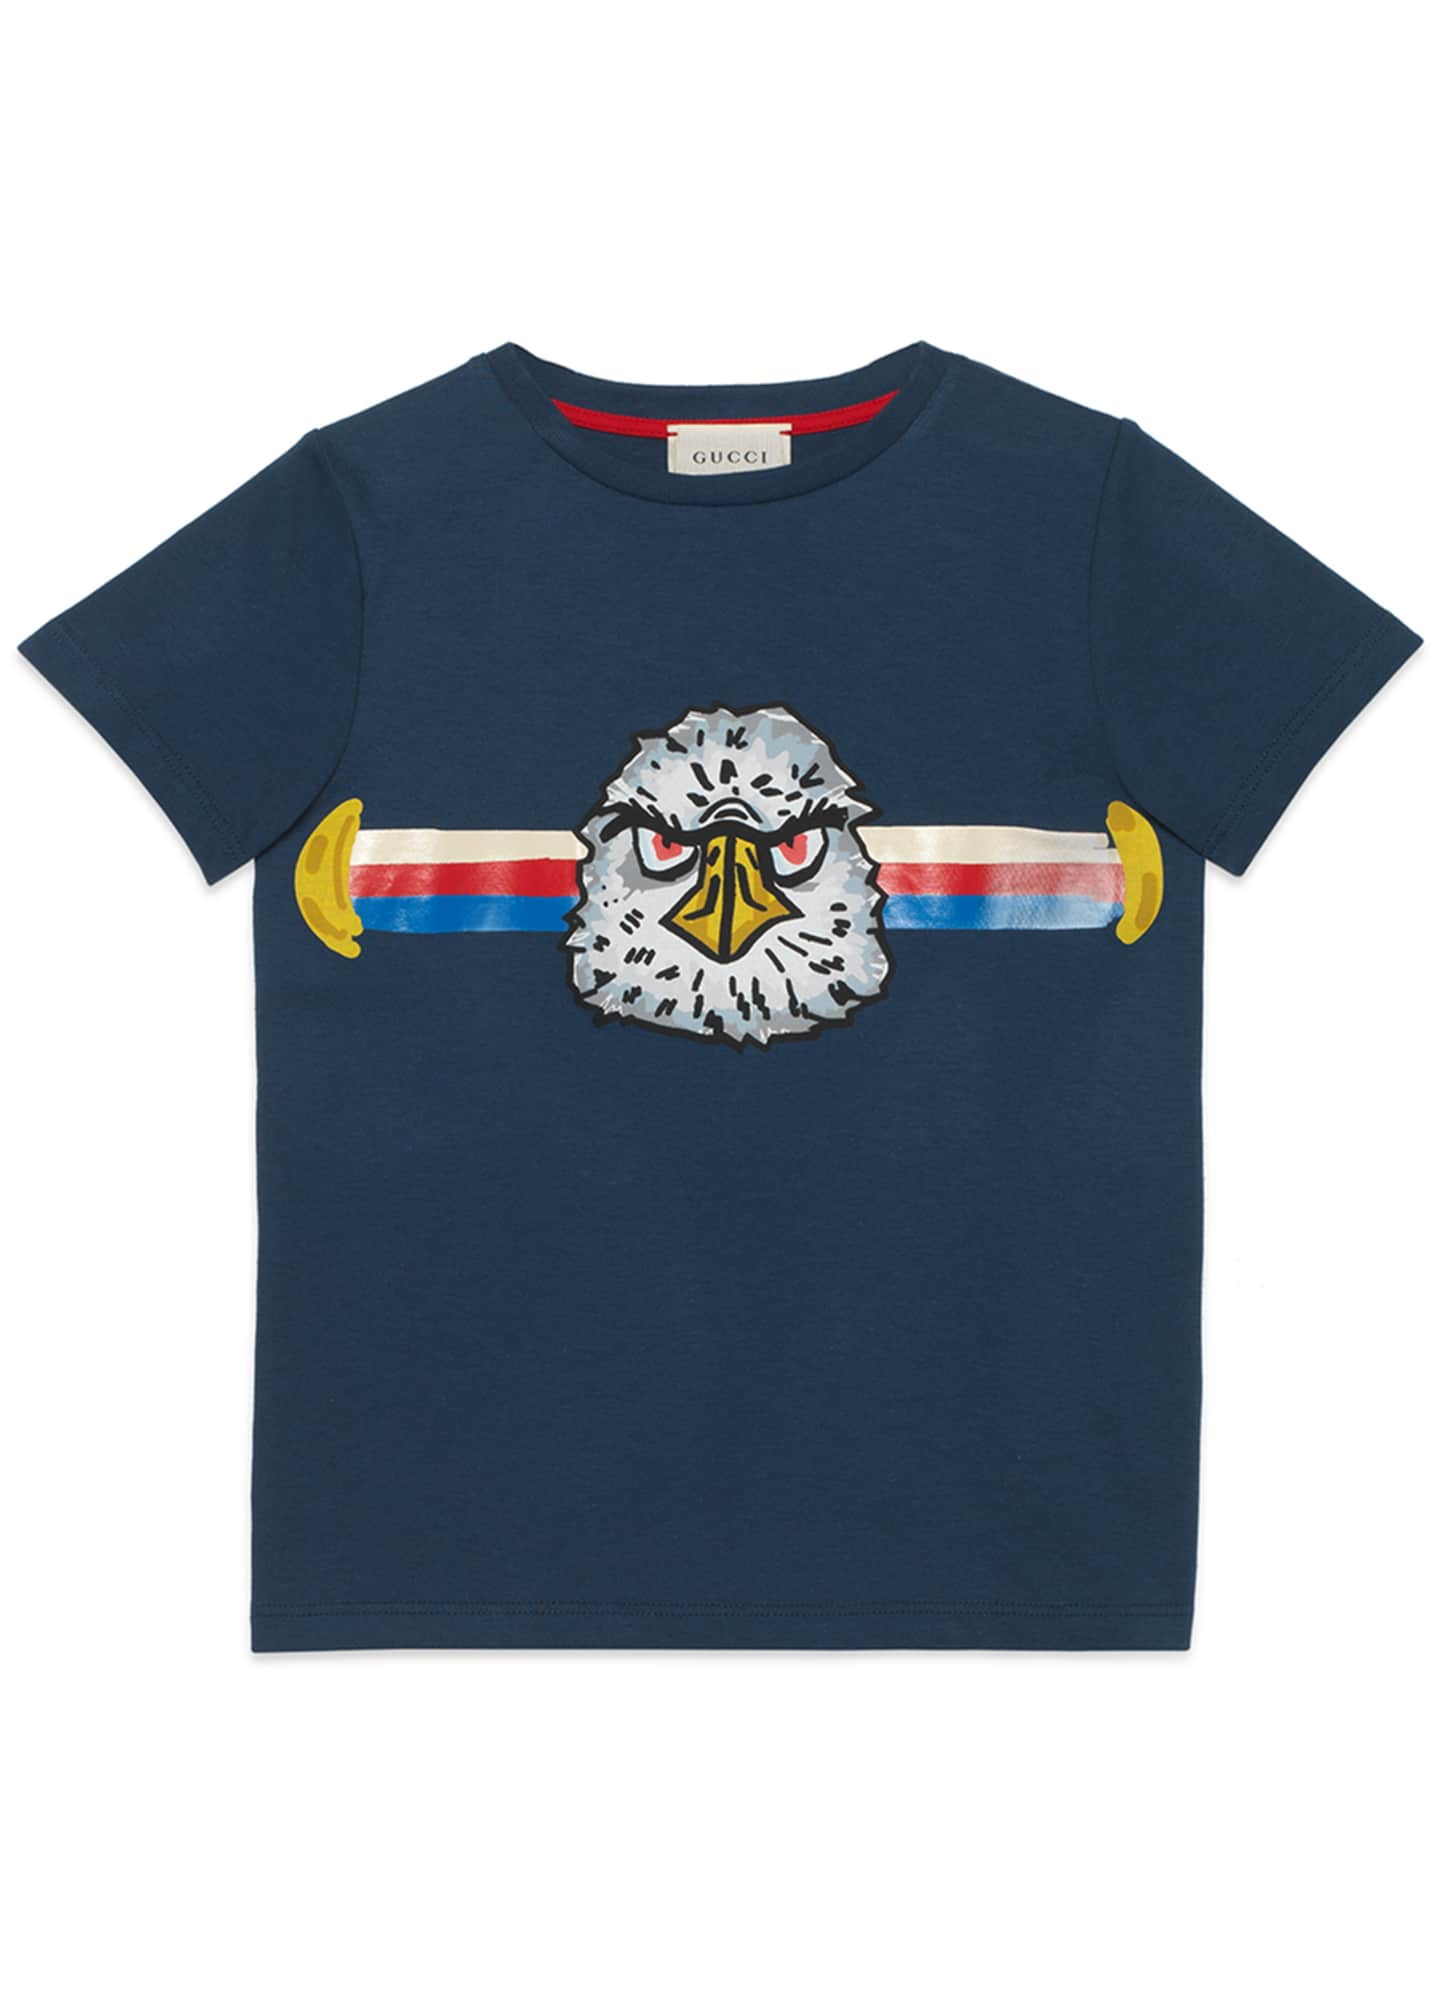 Gucci Bird & Logo Short-Sleeve Tee, Size 4-12